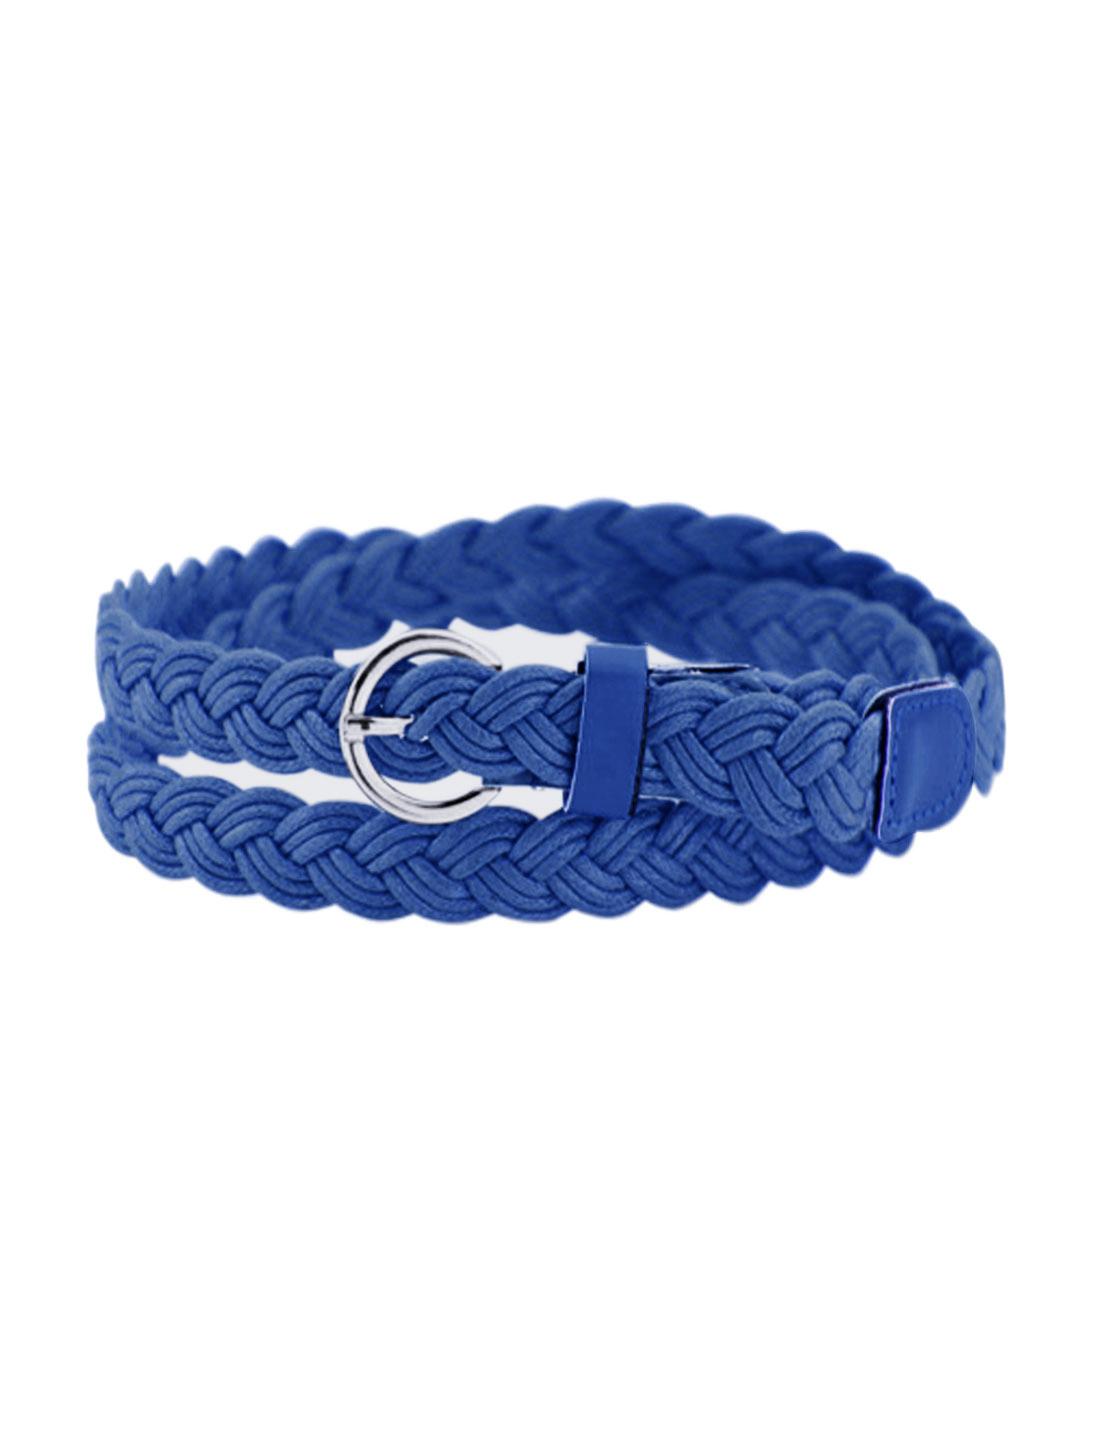 Women Adjustable Single Pin Buckle Skinny Braided Belt Blue